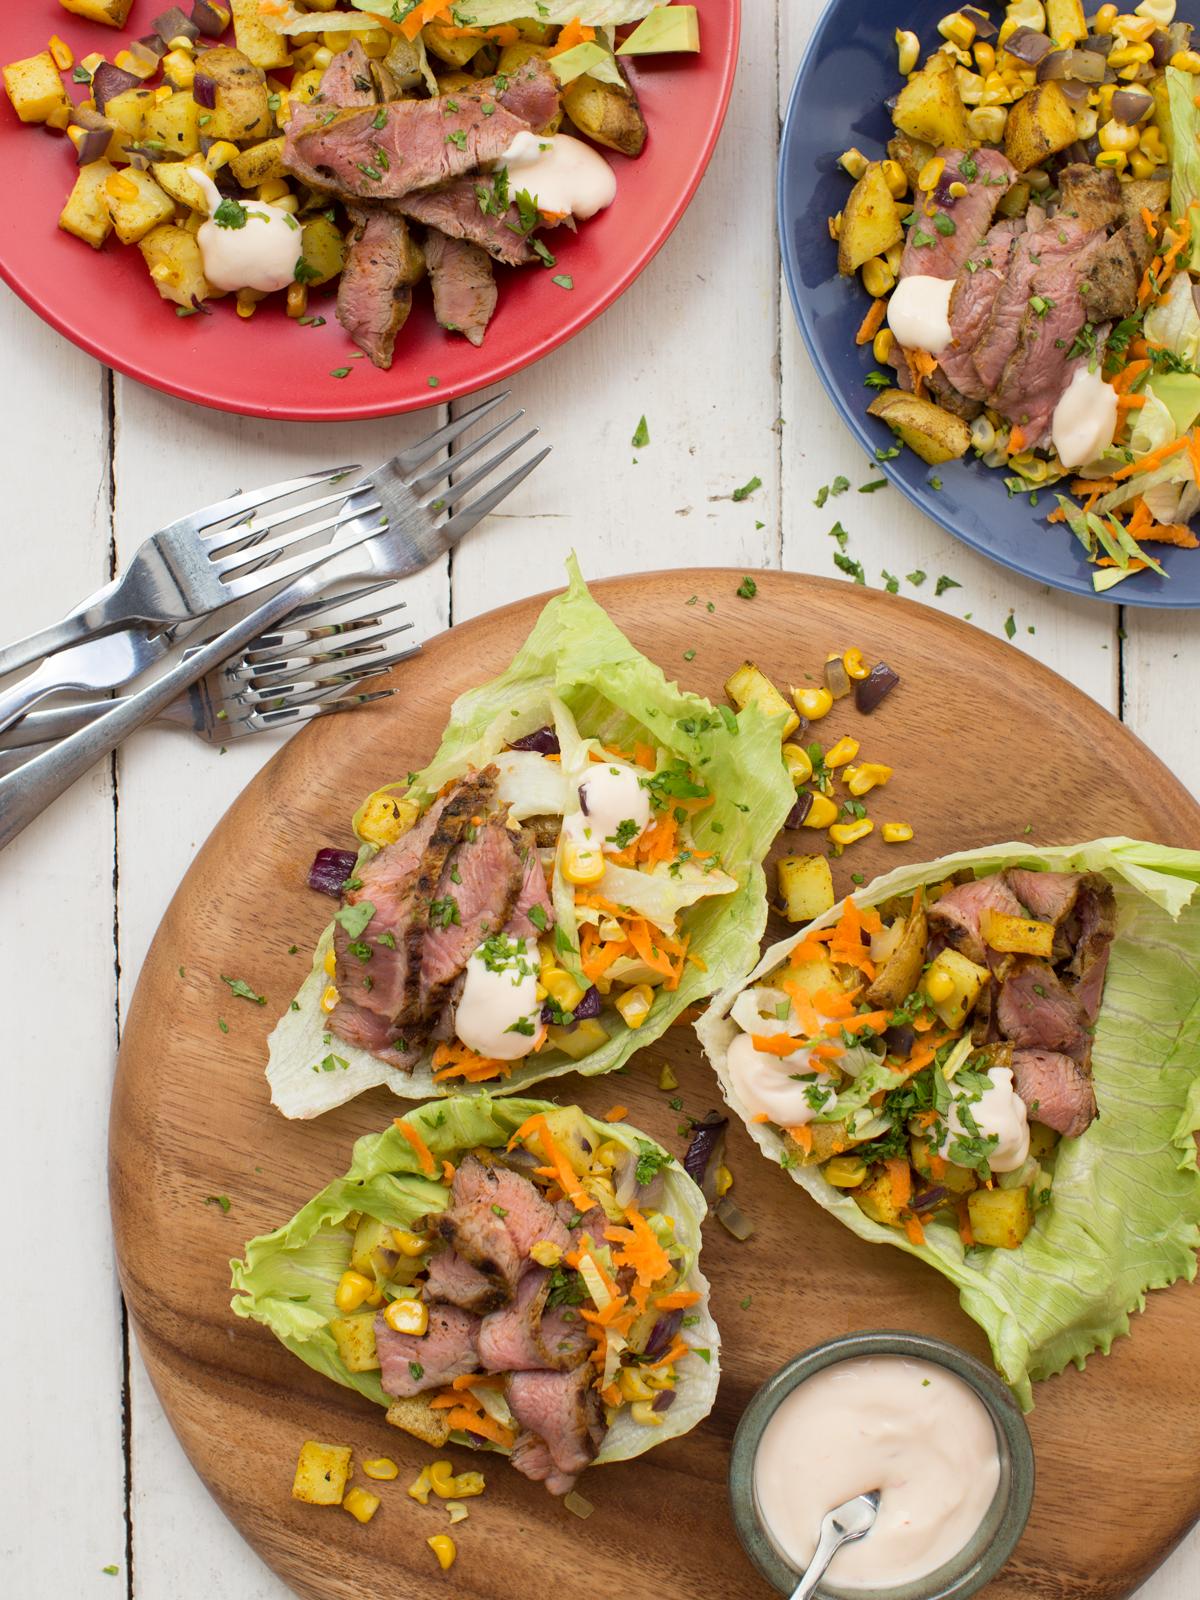 Mexican Lamb with Potato, Corn and Salad